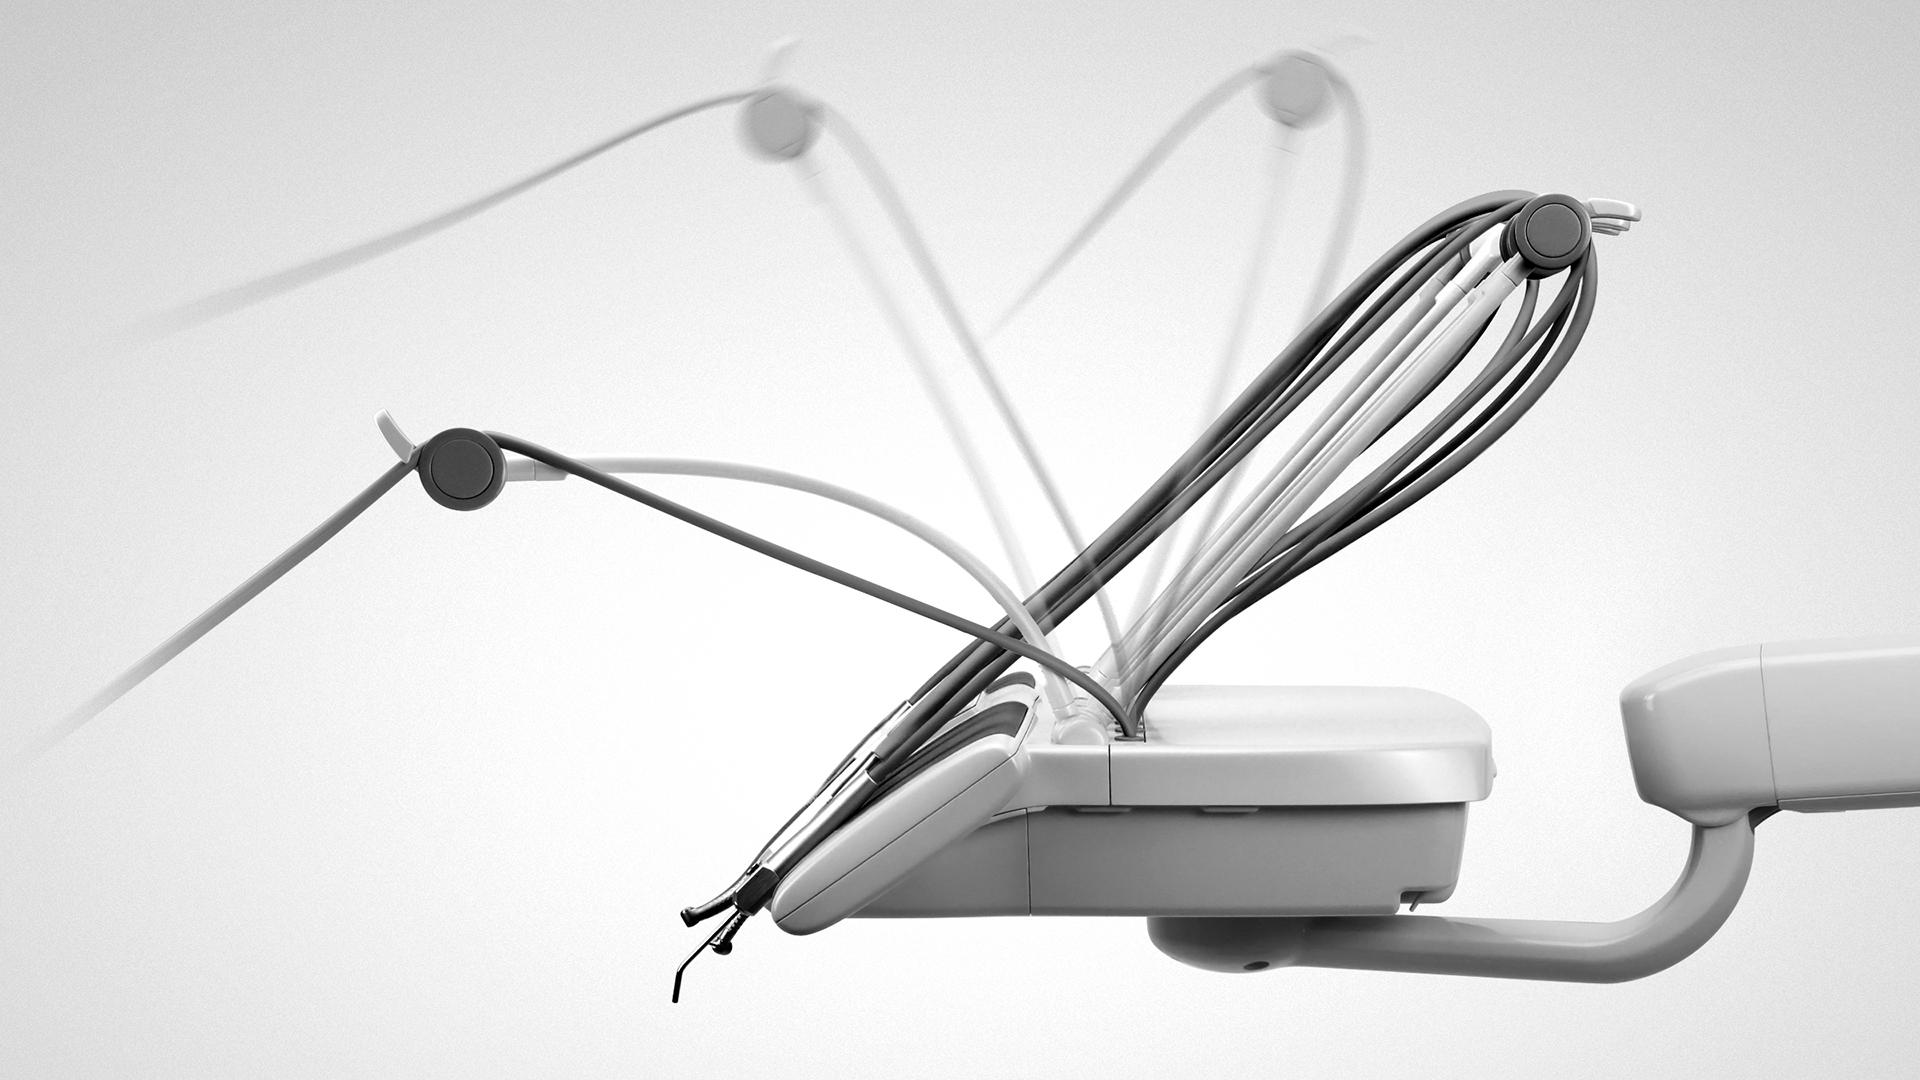 priority_designs_midmark_dental_equipment_design_engineering_prototyping_009